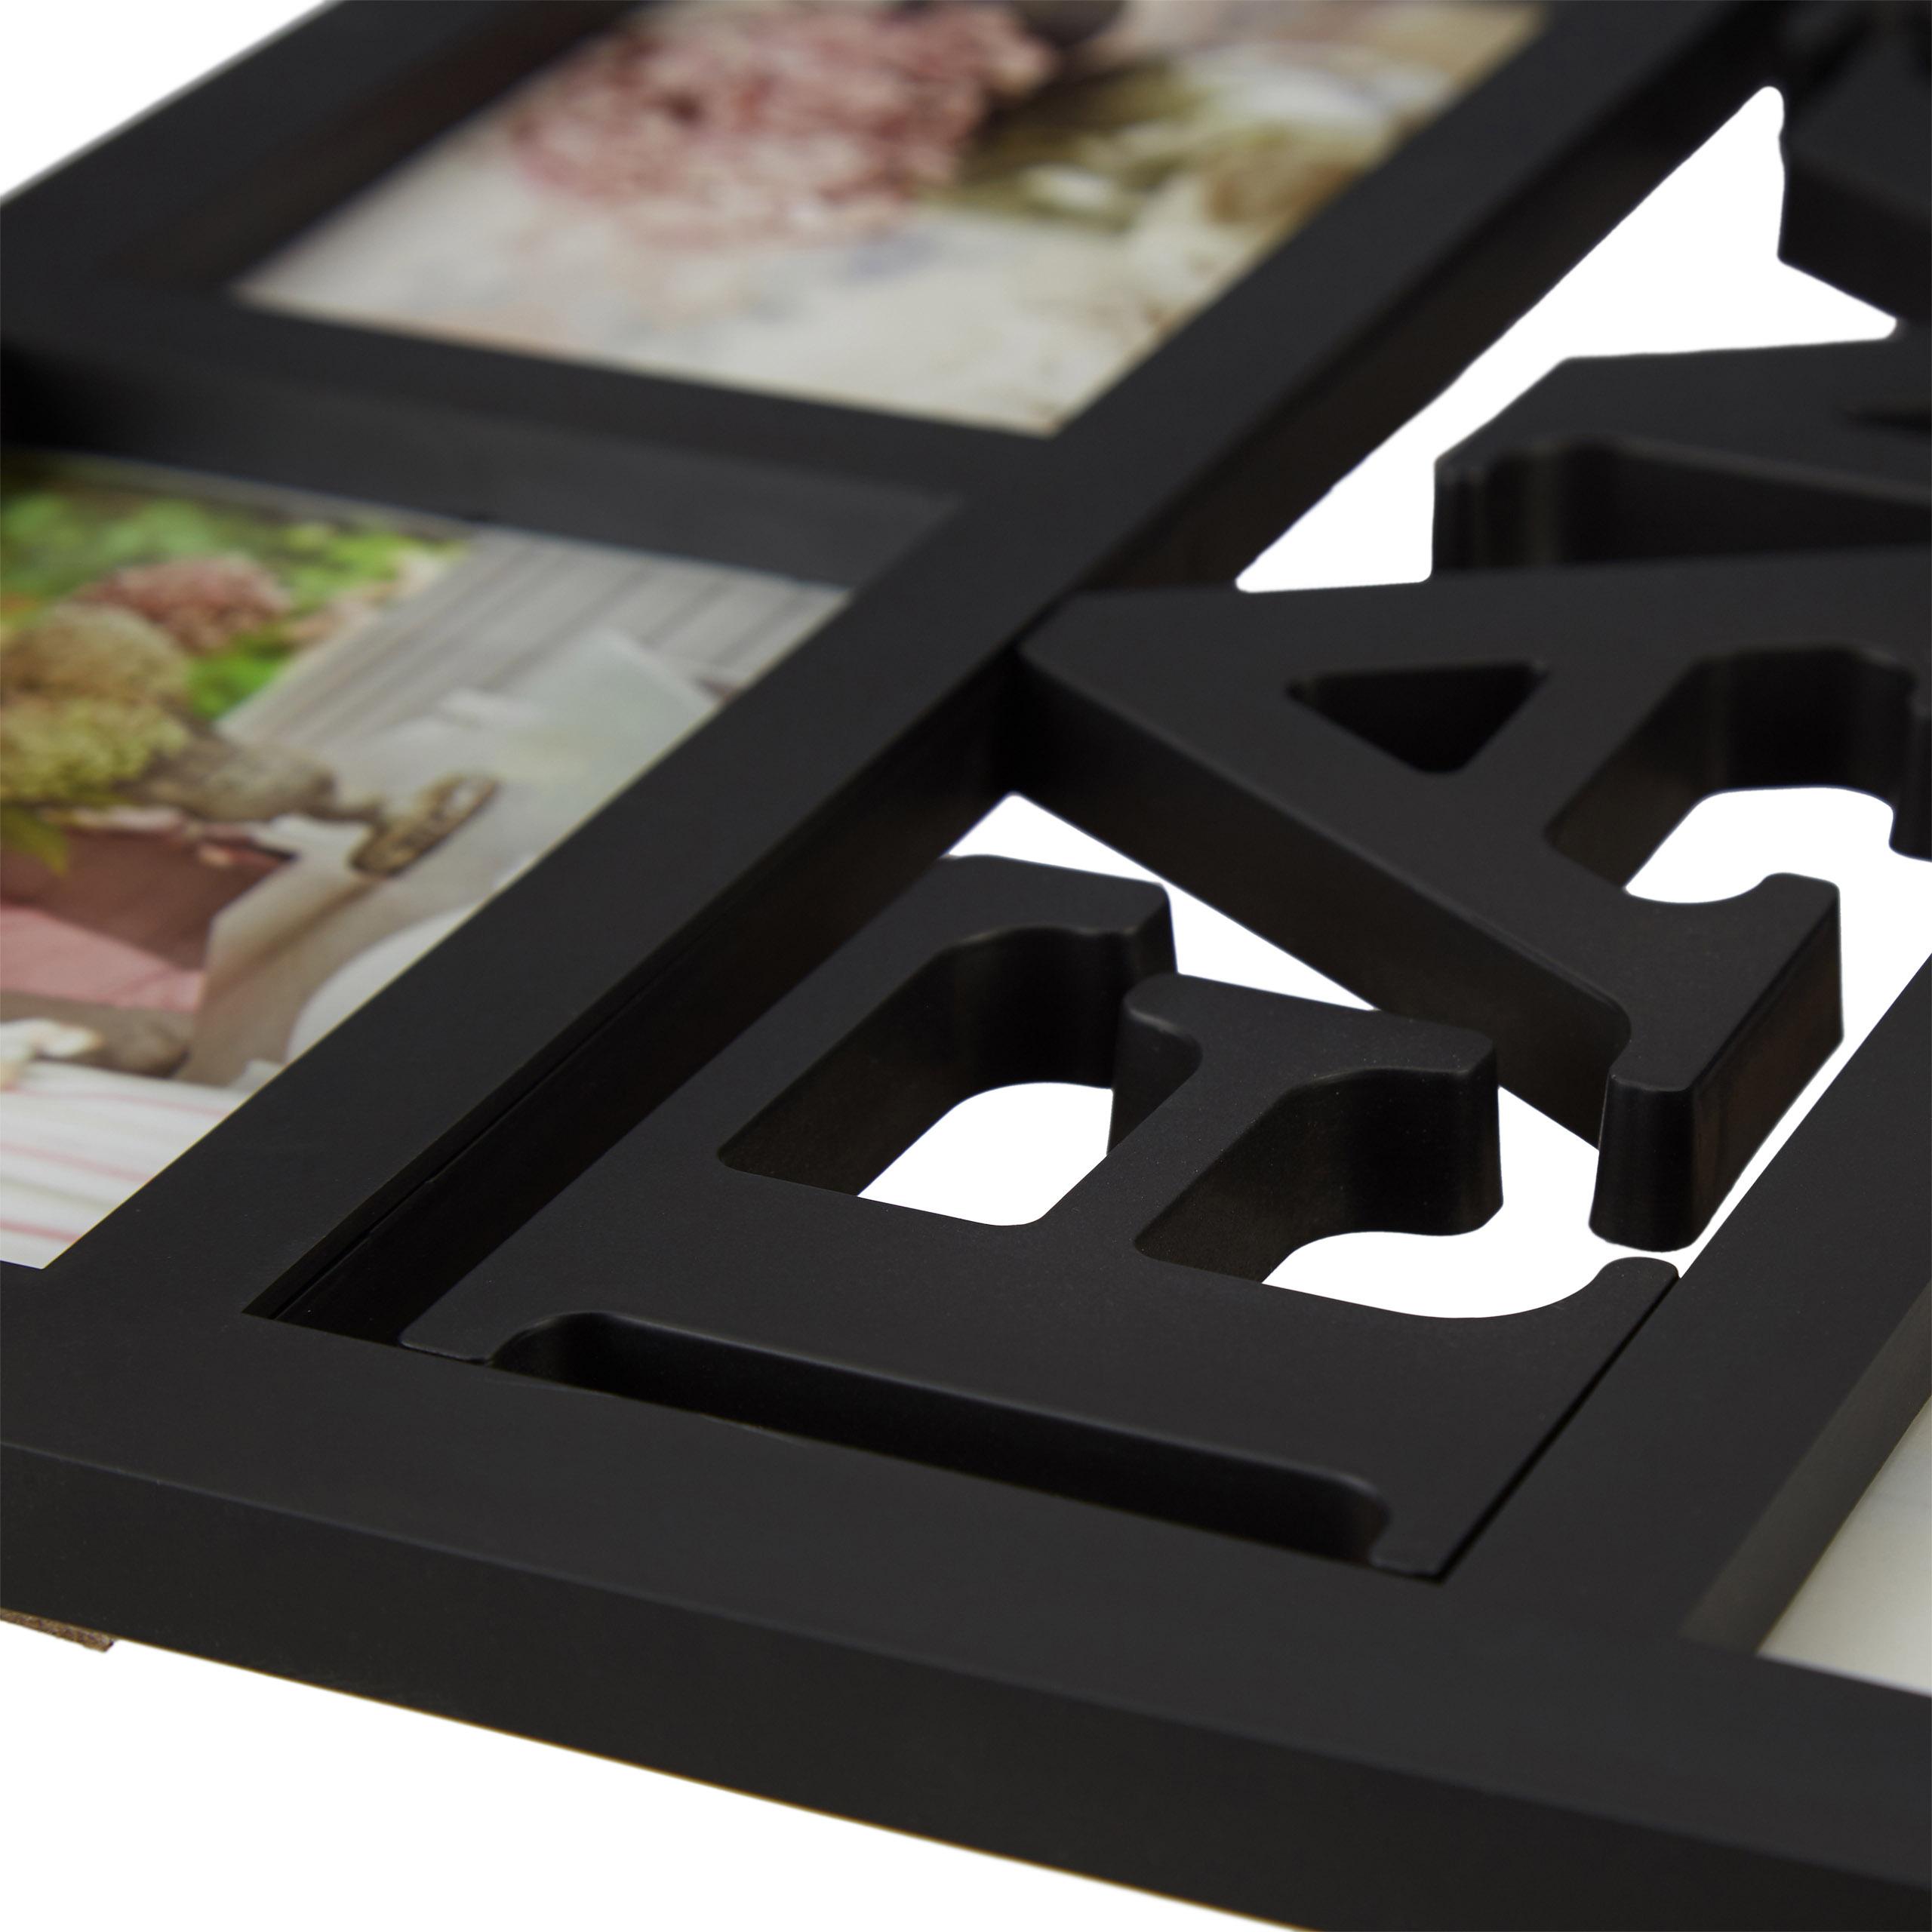 Fein Großhandel Bilderrahmen 5x7 Fotos - Benutzerdefinierte ...